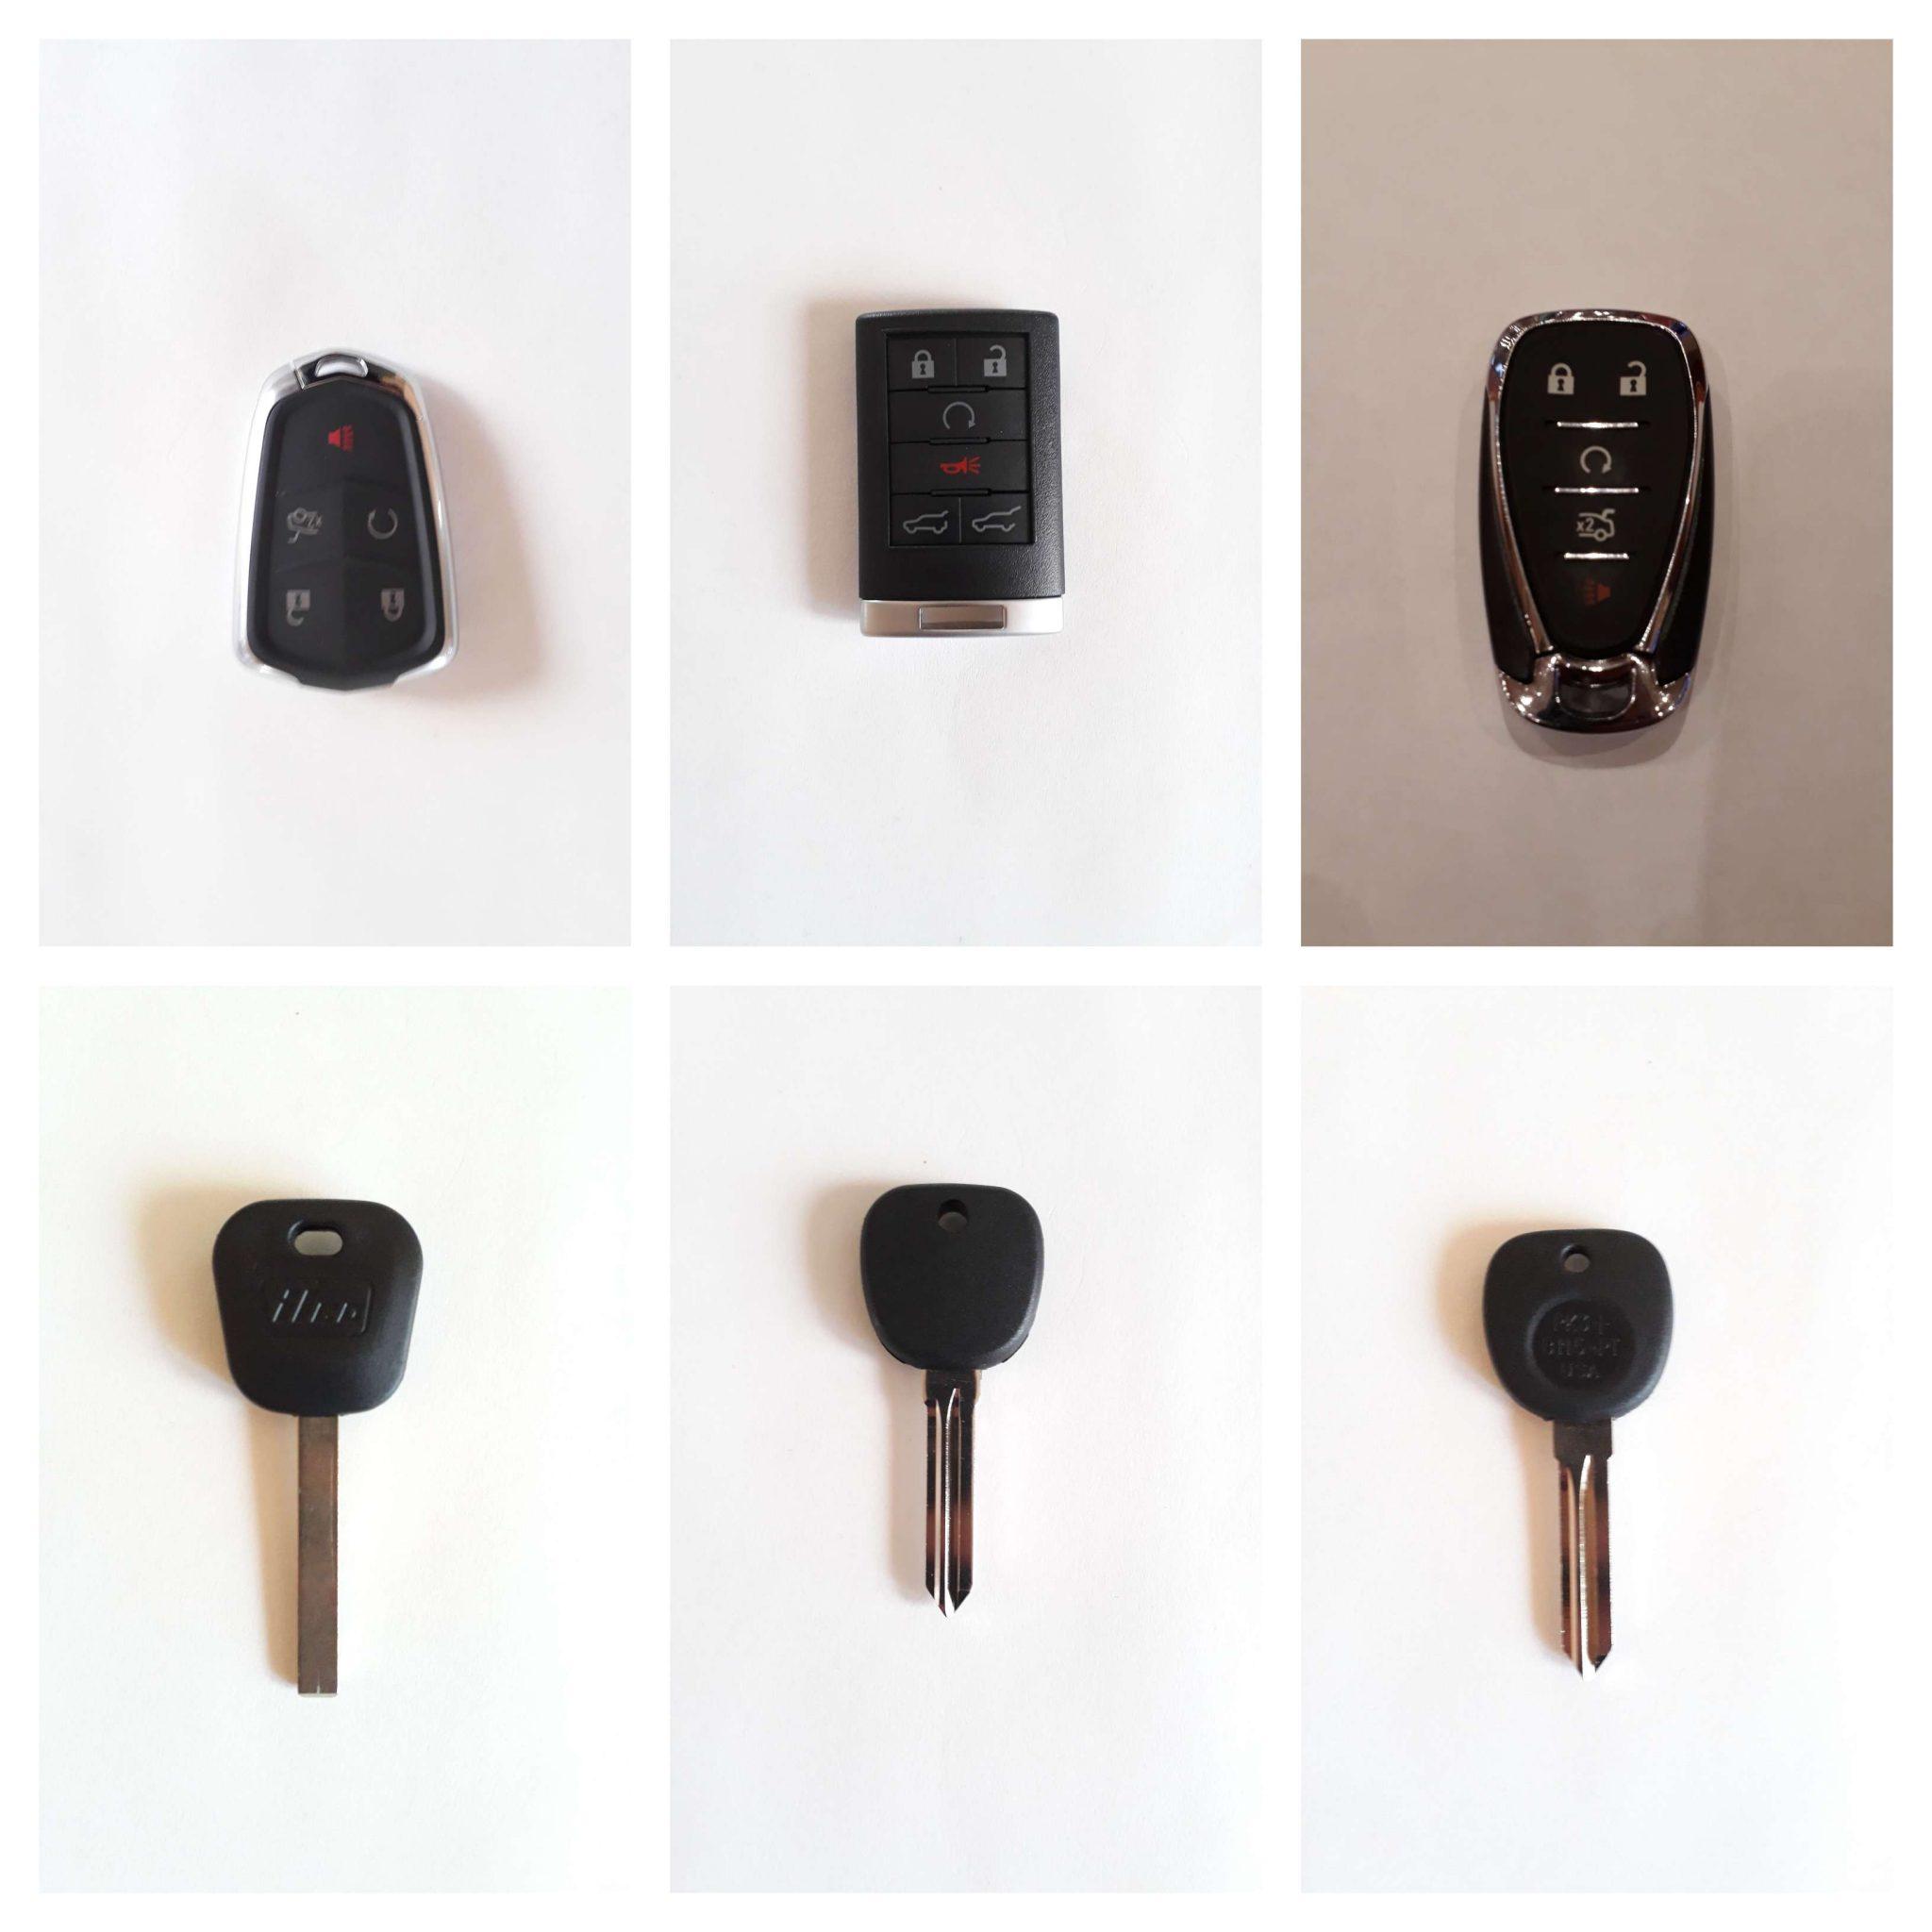 Pontiac Chevy Oldsmoble Uncut Transponder Ignition Key fits PK3 Buick Saturn